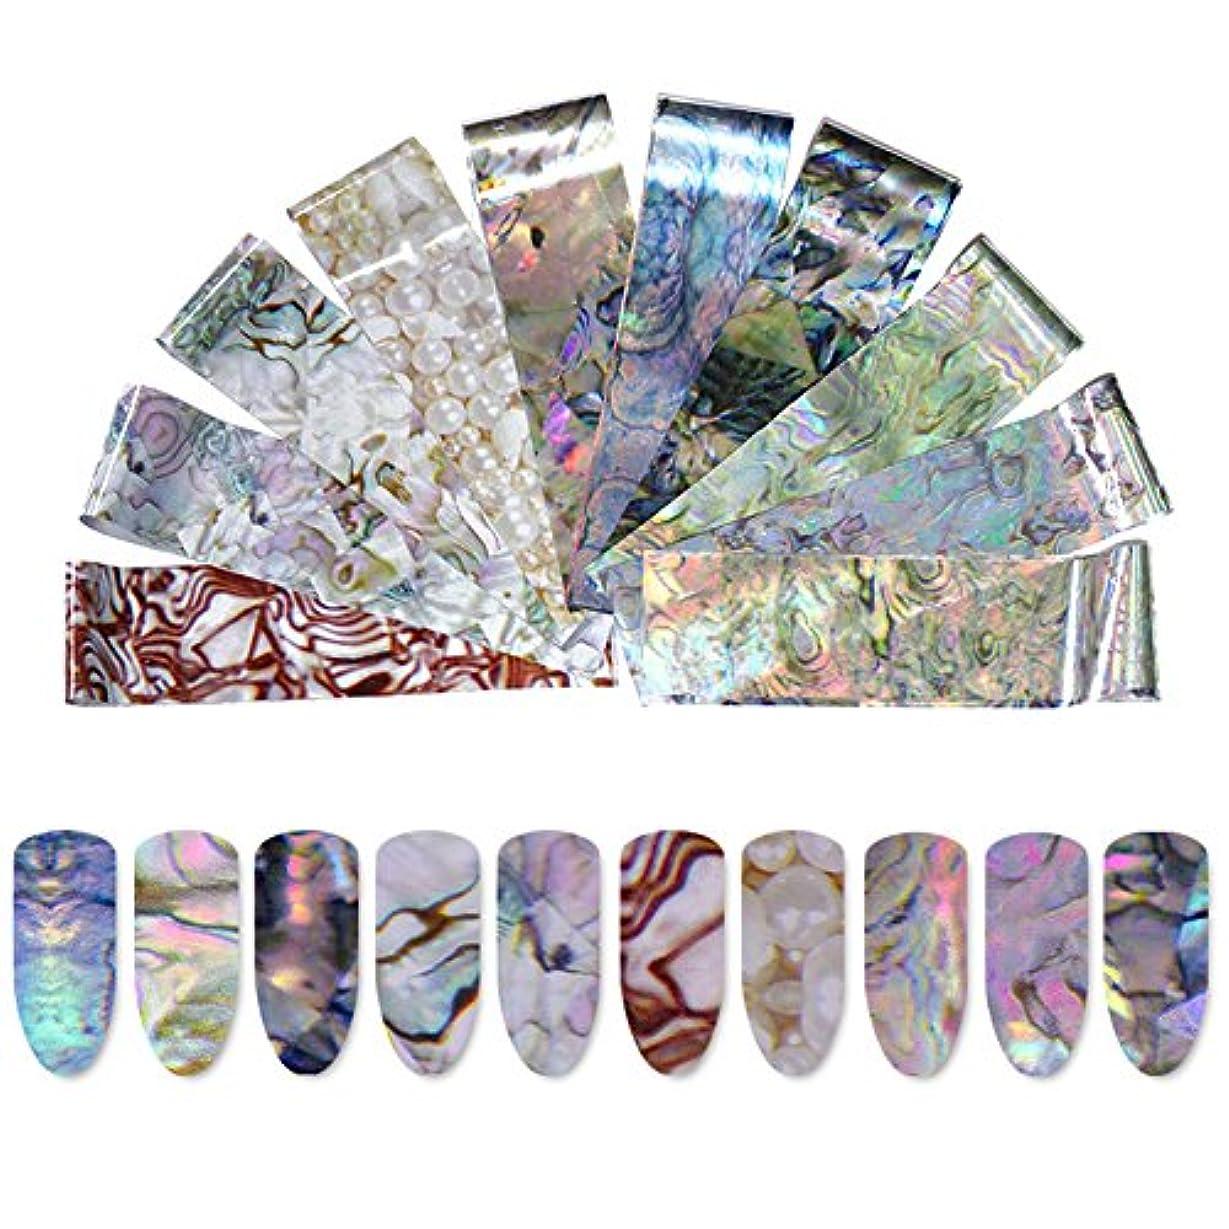 UR SUGAR 貝殻柄ネイルホイル 星空ネイル シェル 大理石 オーロラネイル ホログラム 転写ホイル 箔紙 シェルプリント 極薄フィルム 埋め込み 10種類セット [並行輸入品]